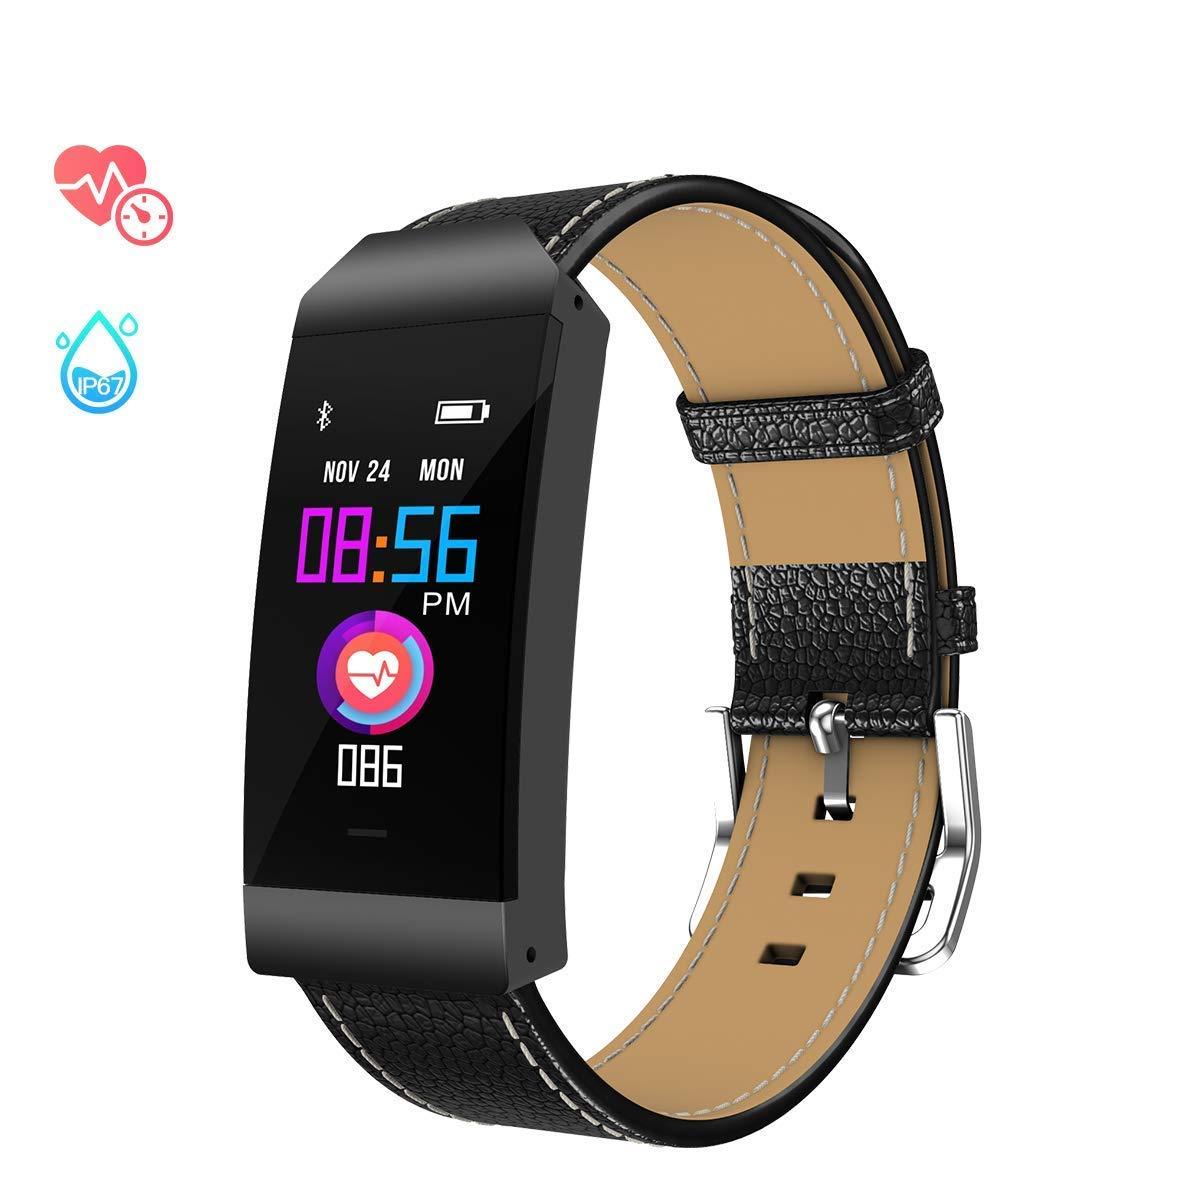 GOKOO Reloj Inteligente Mujer Pulseras de Actividad Reloj de Fitness Smartwatch Deporte Fitness Tracker Impermeable IP67 con Pulsómetros Podómetro Monitor ...